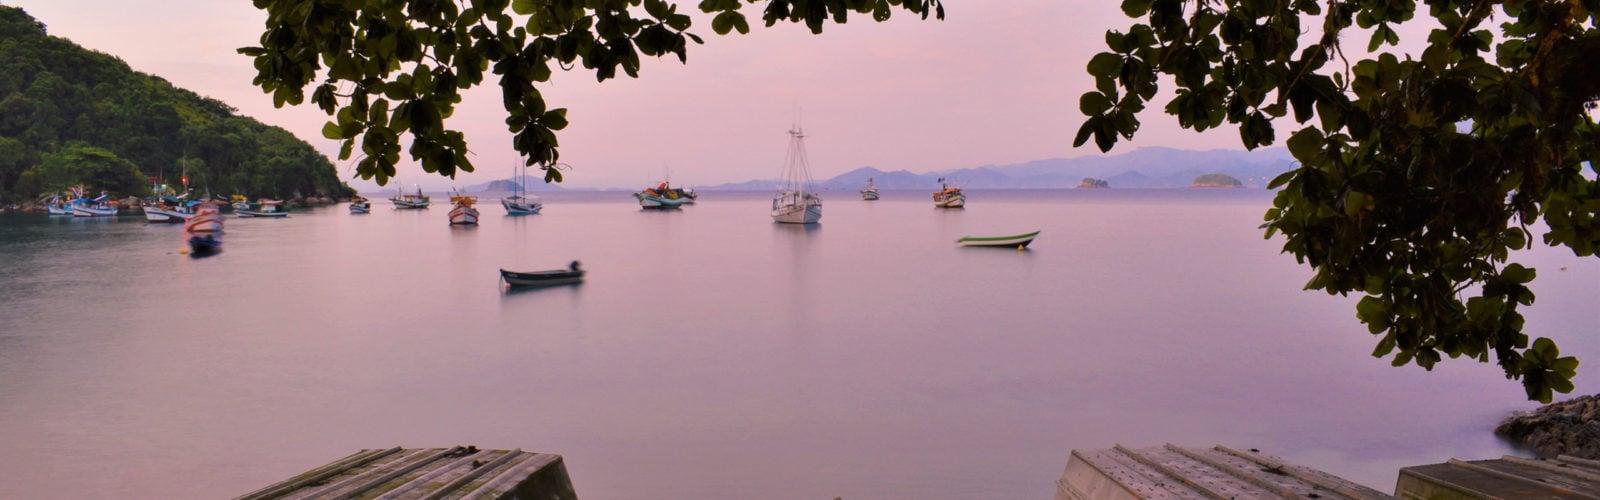 picinguaba-sunrise